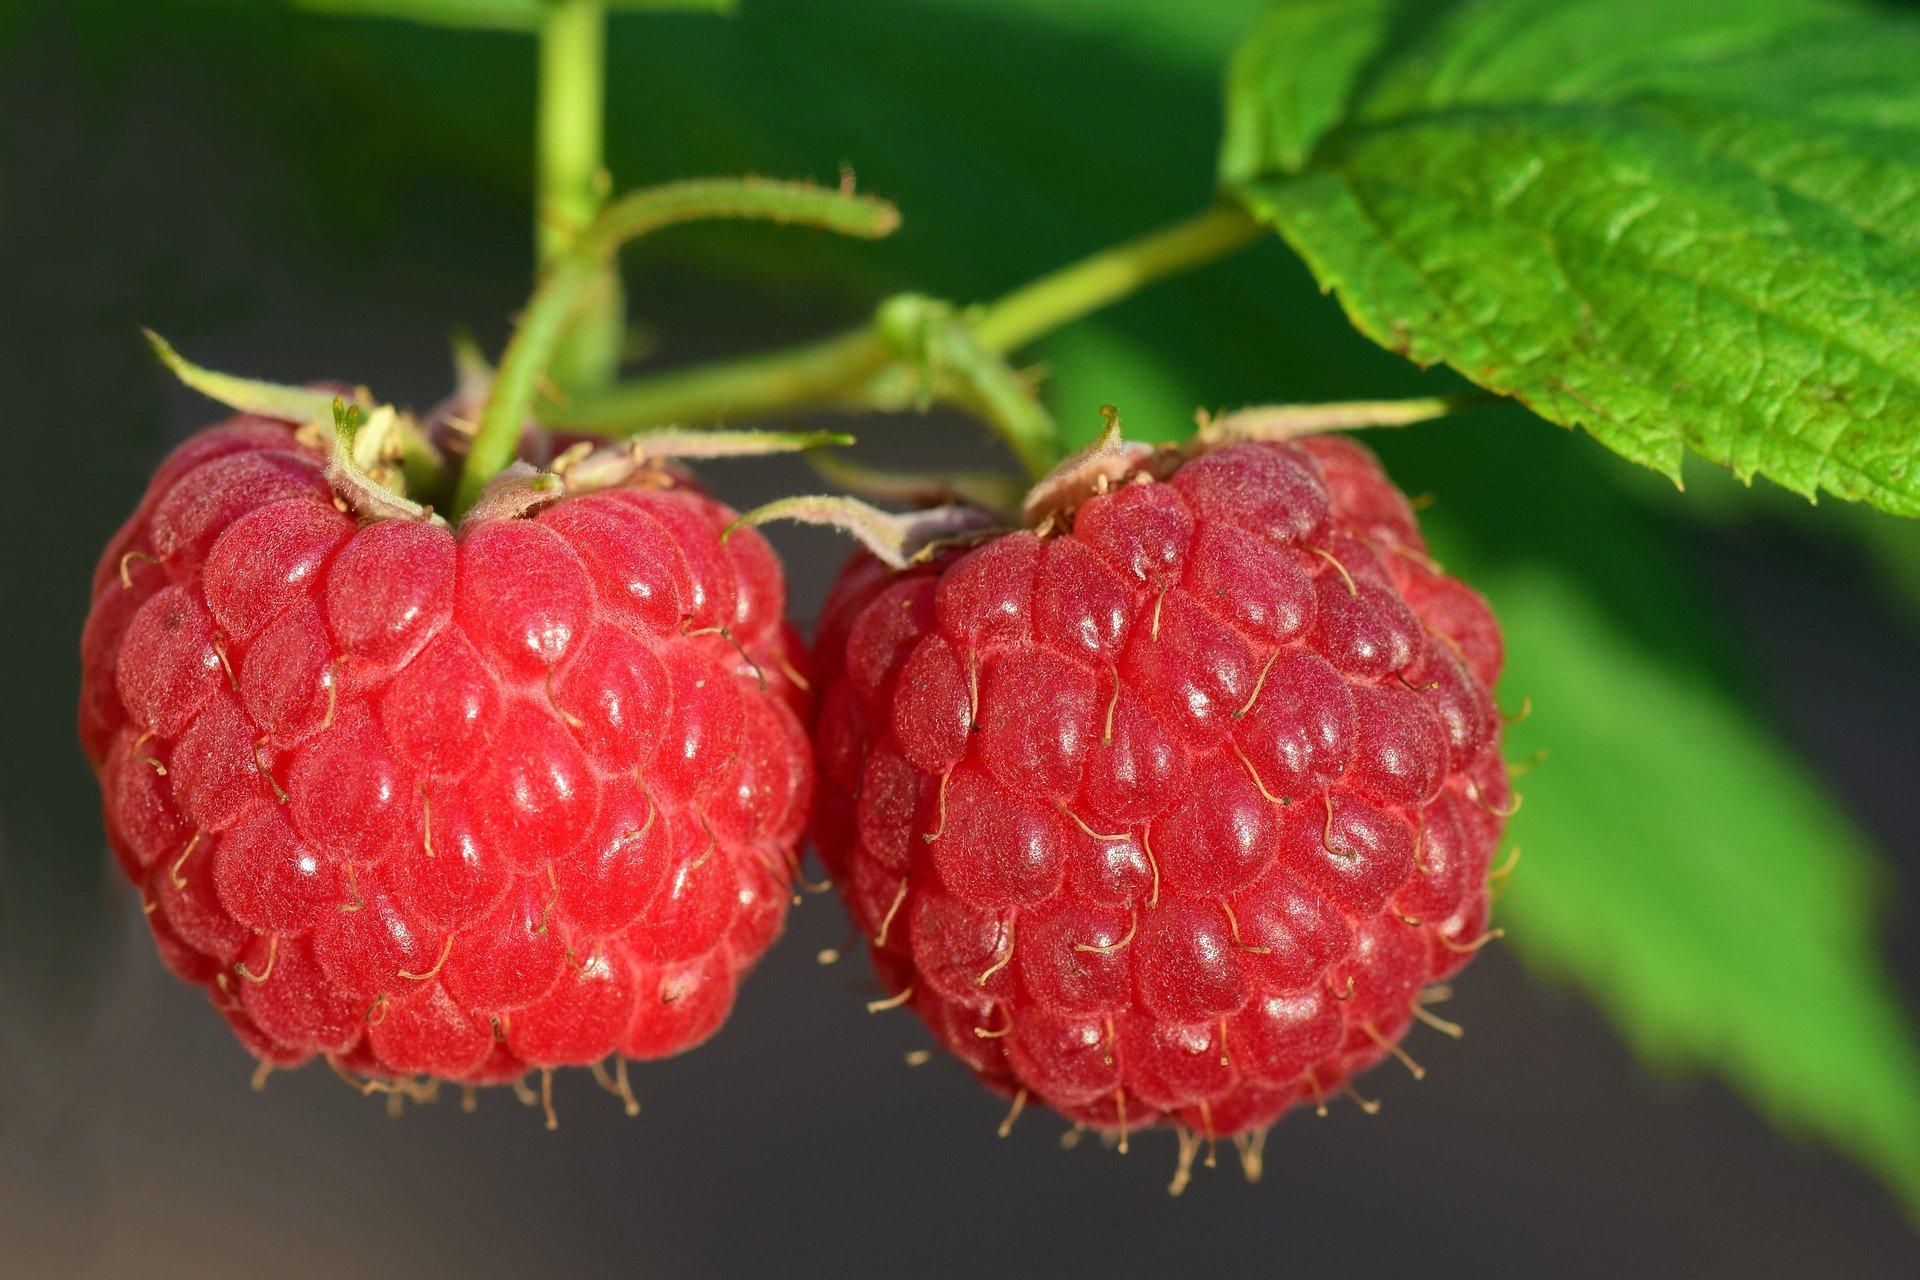 raspberries-3454504_1920